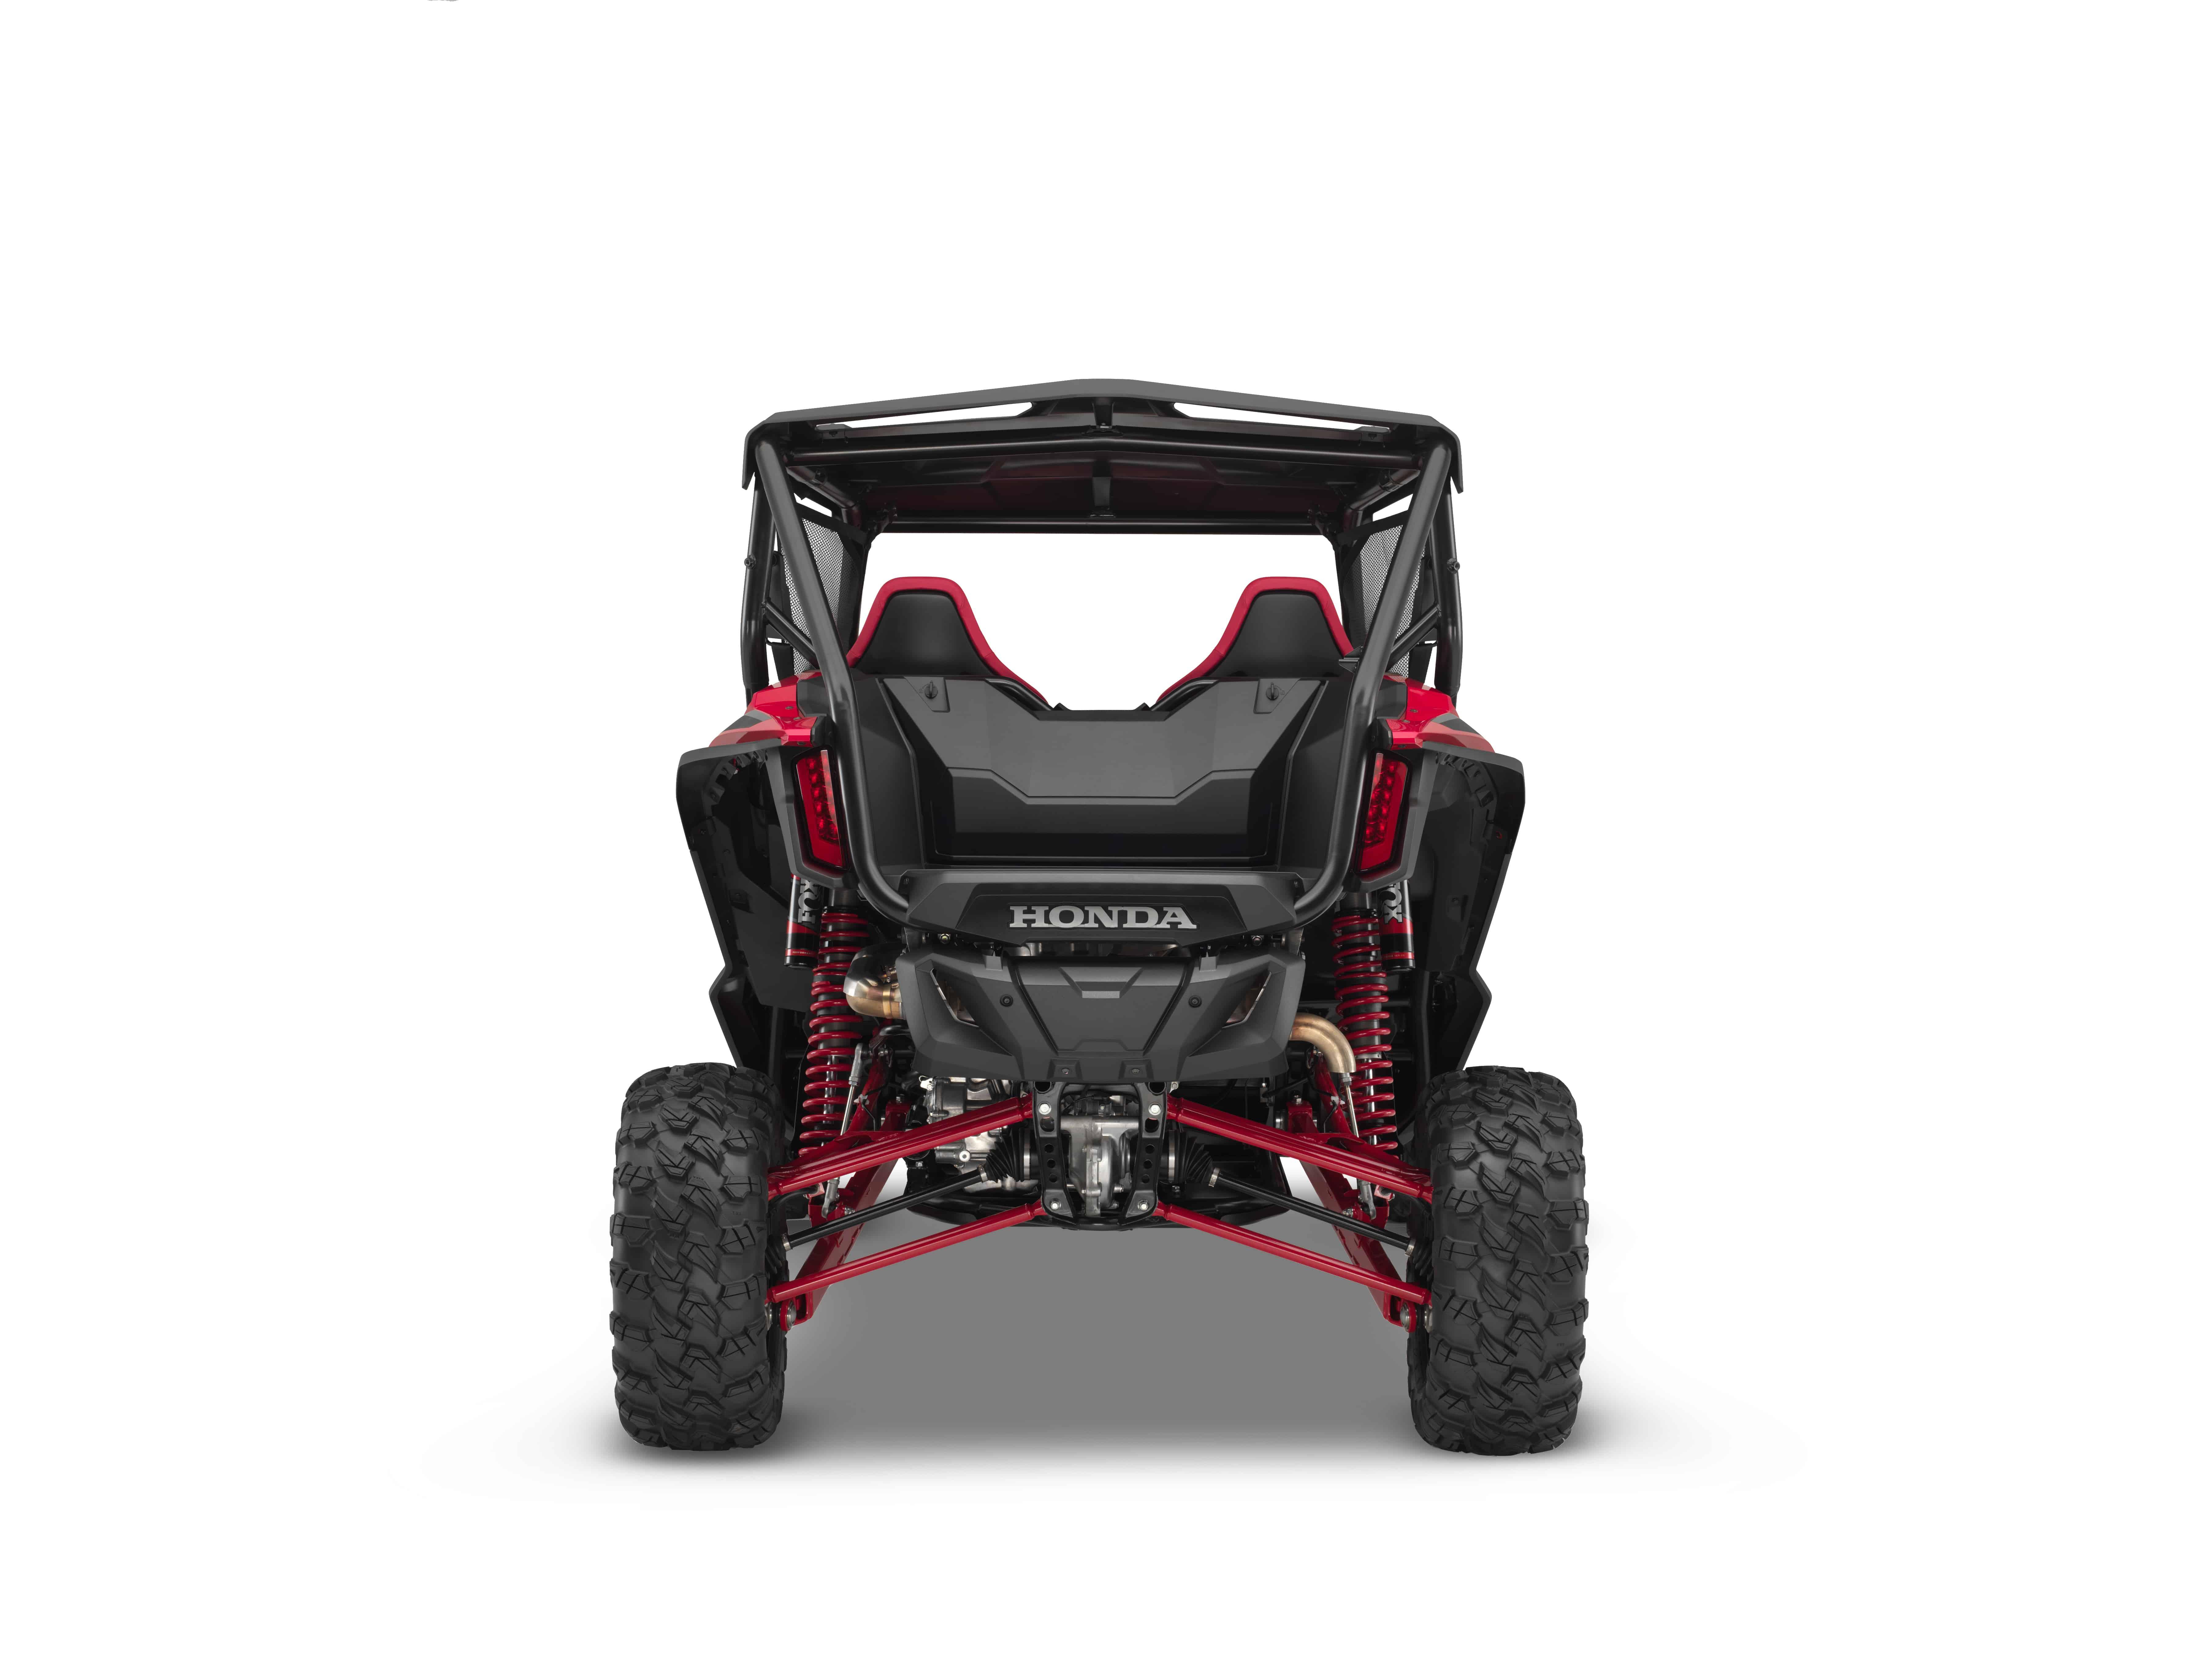 Utv Rear View Mirror >> Honda Releases The All-New Talon 1000R and 1000X! - UTV Sports Magazine